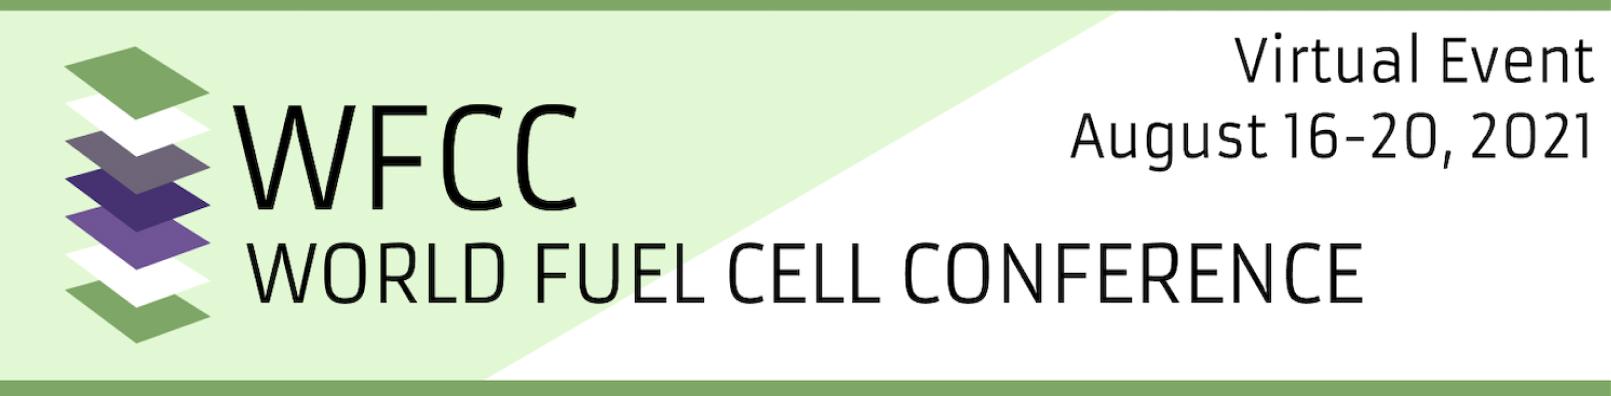 WFCC Banner